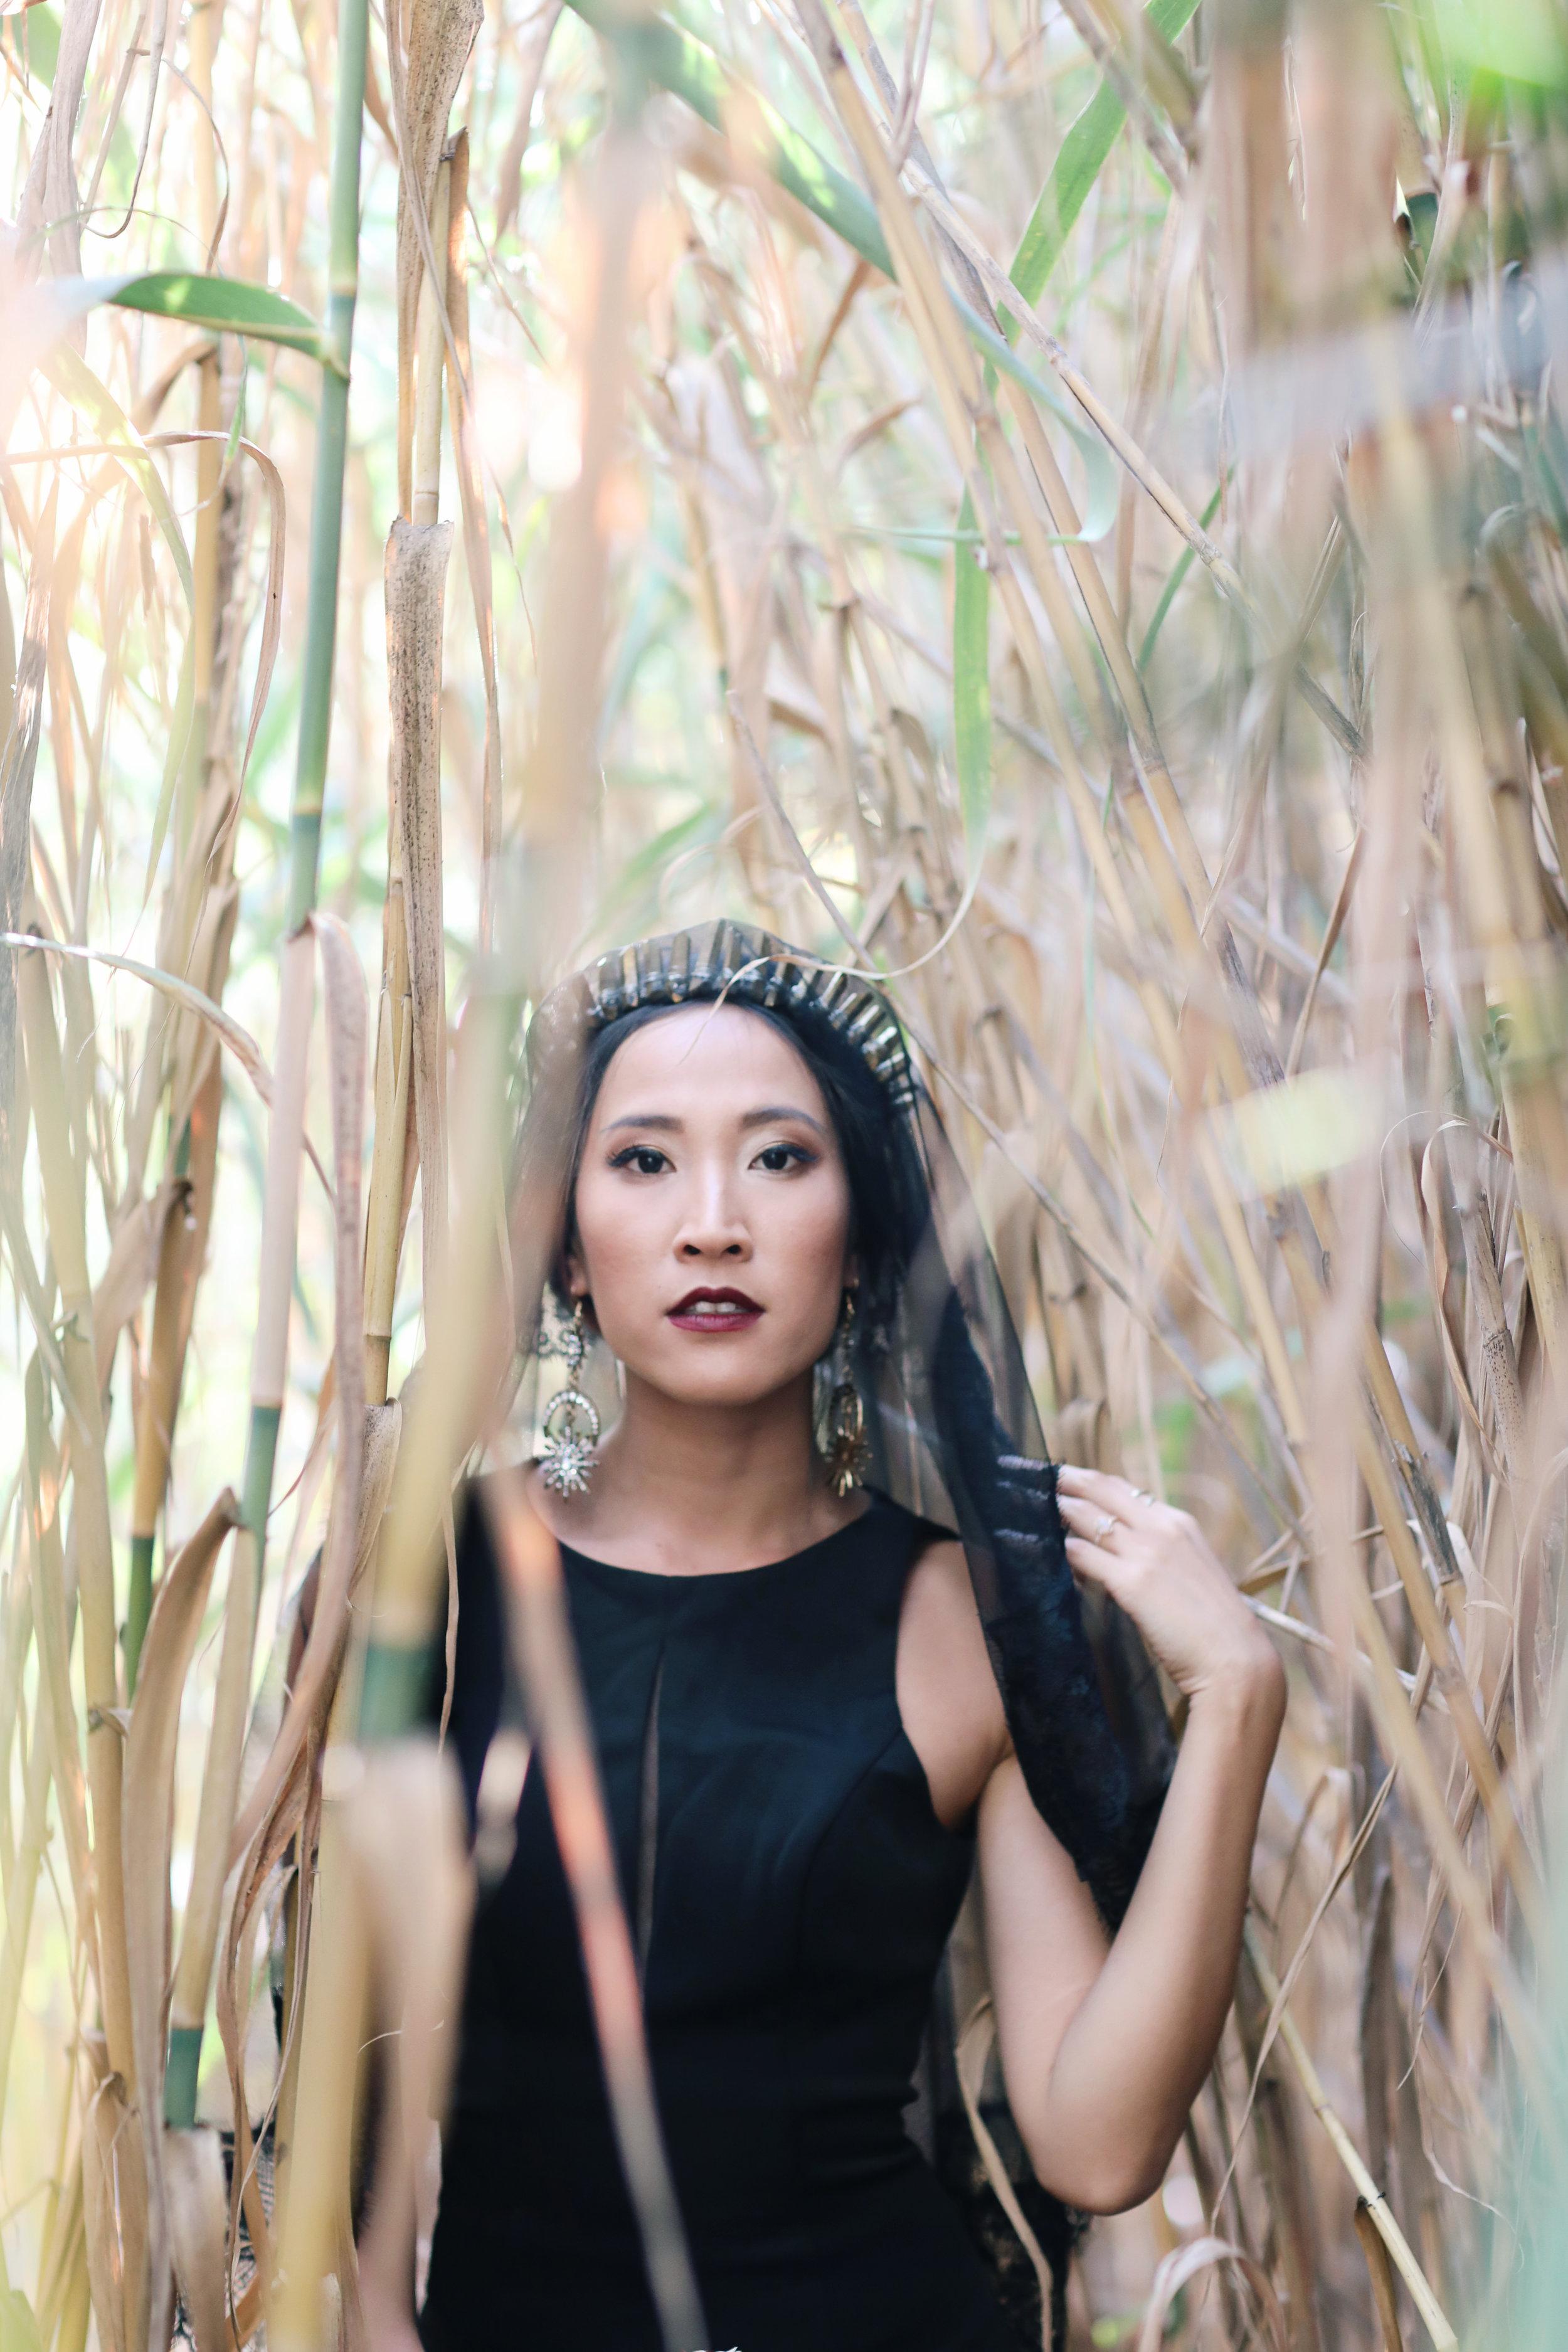 Bride in a black wedding dress in the reeds in Orange County.